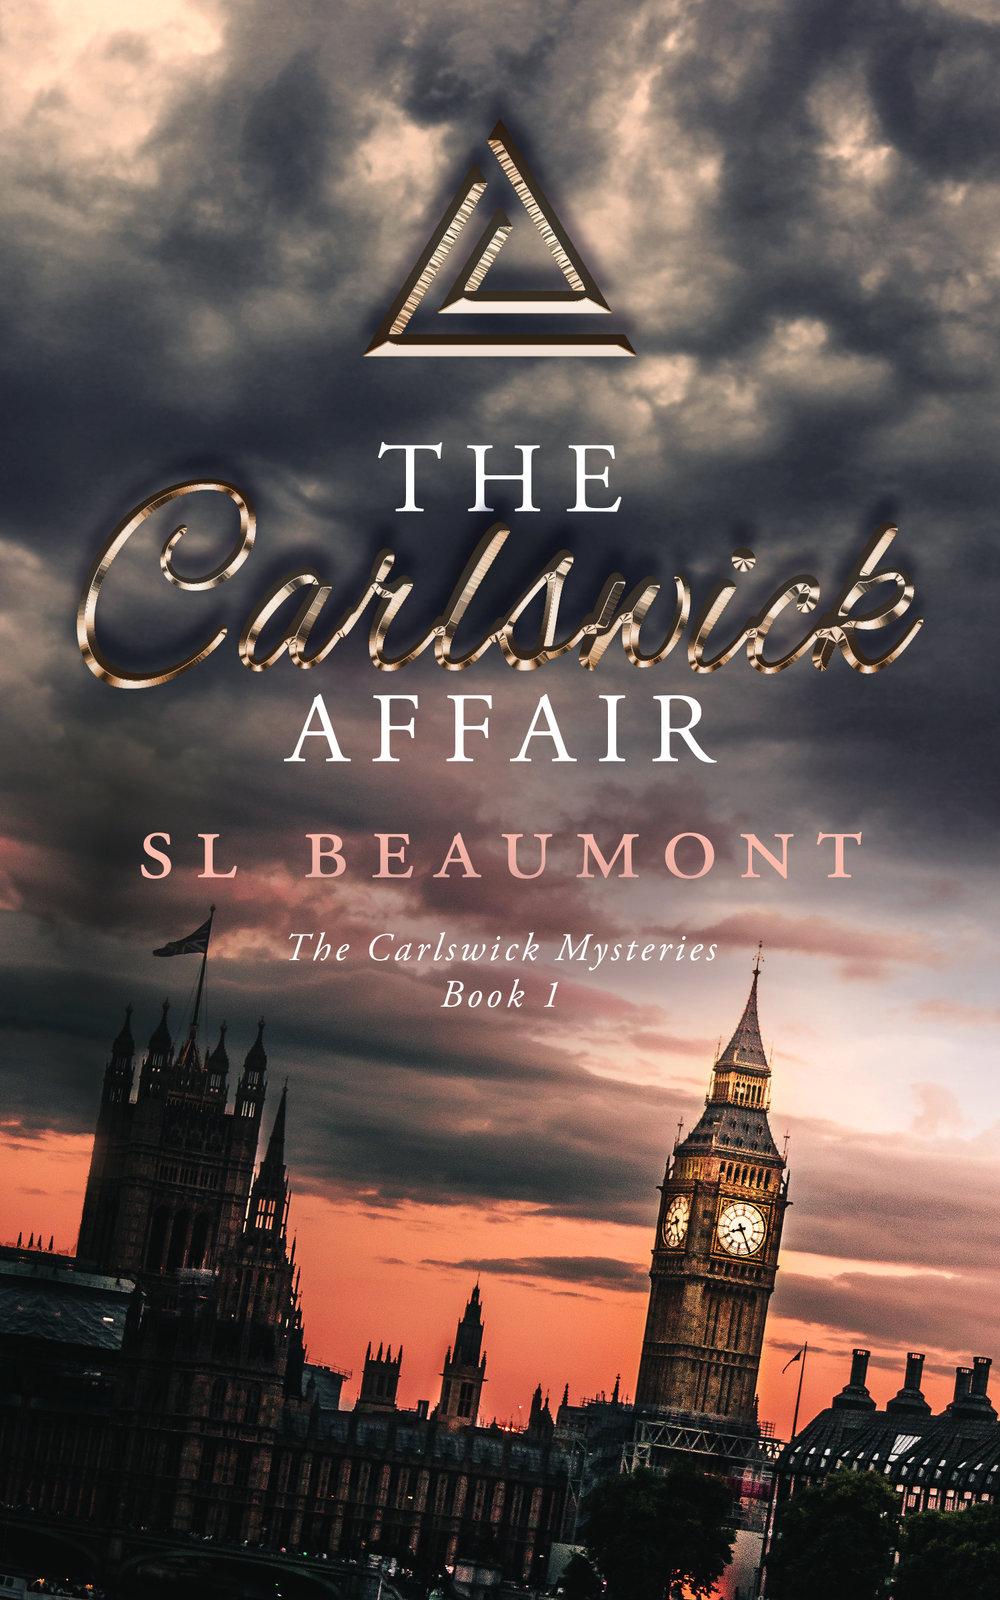 a The Carlswick Affair_eBcov_B1.jpg